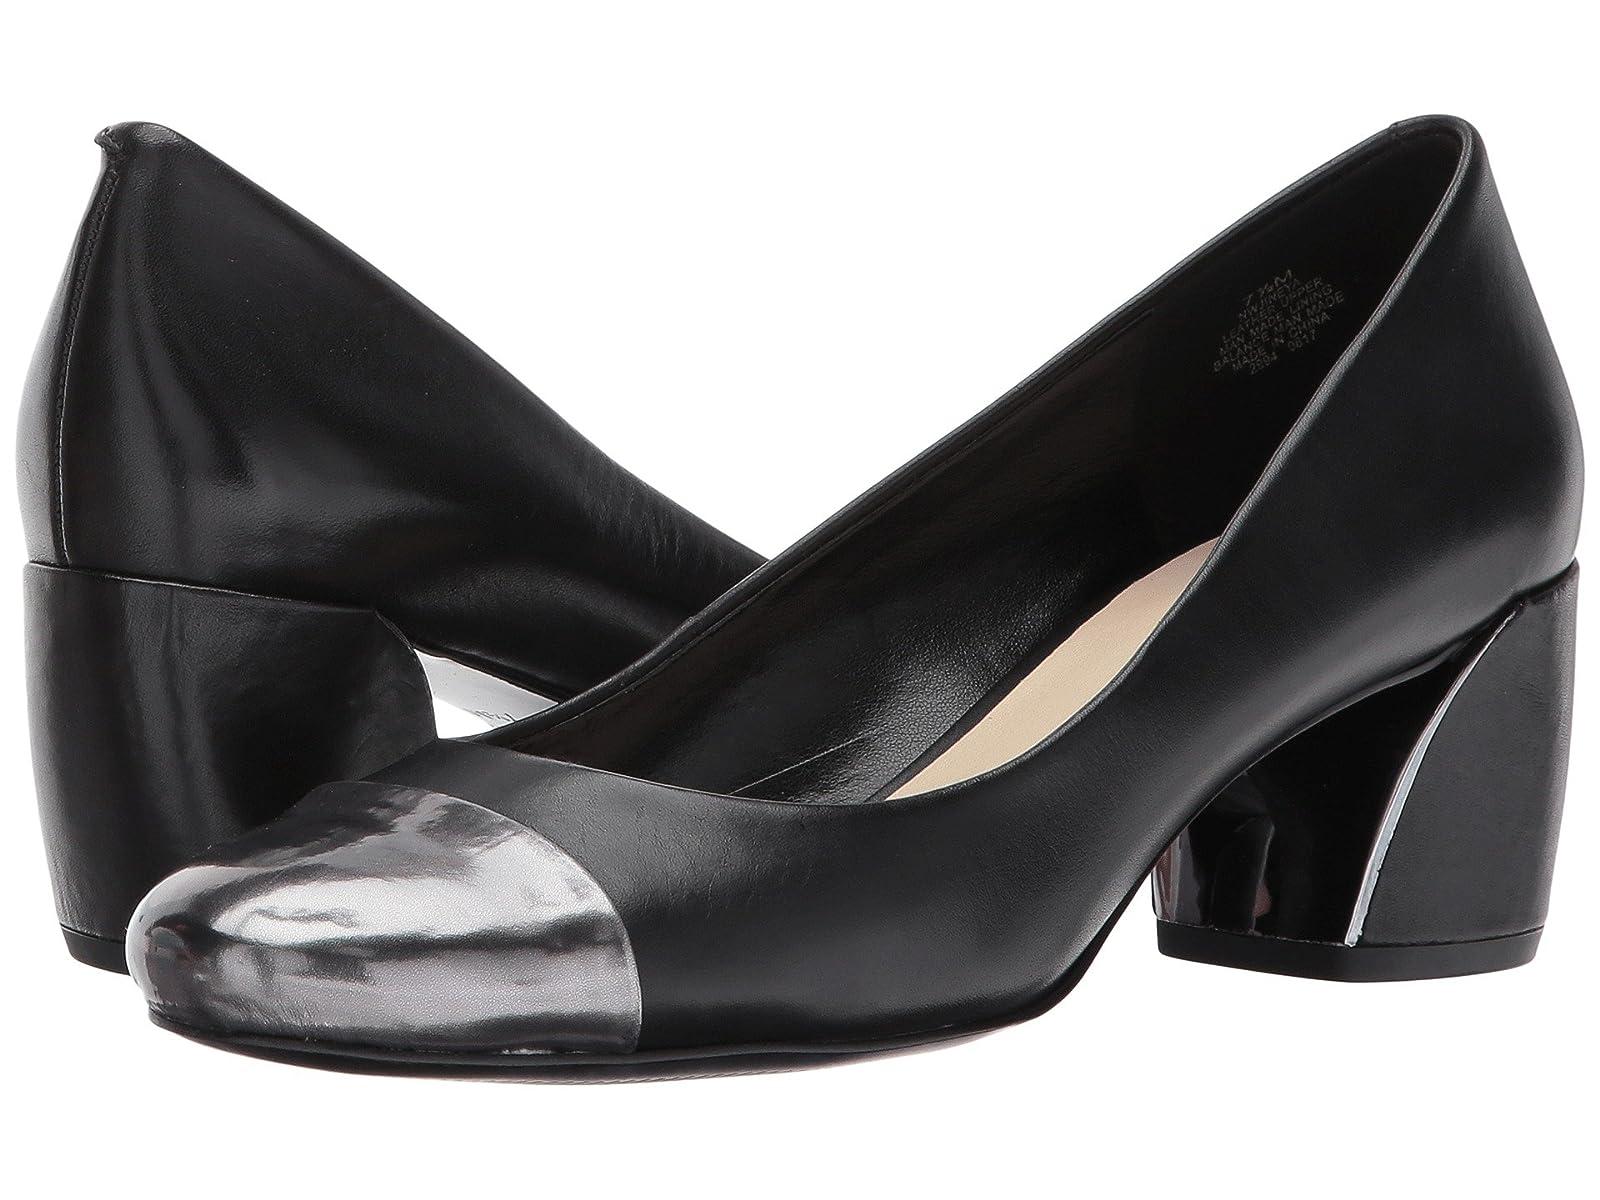 Nine West JineyaCheap and distinctive eye-catching shoes